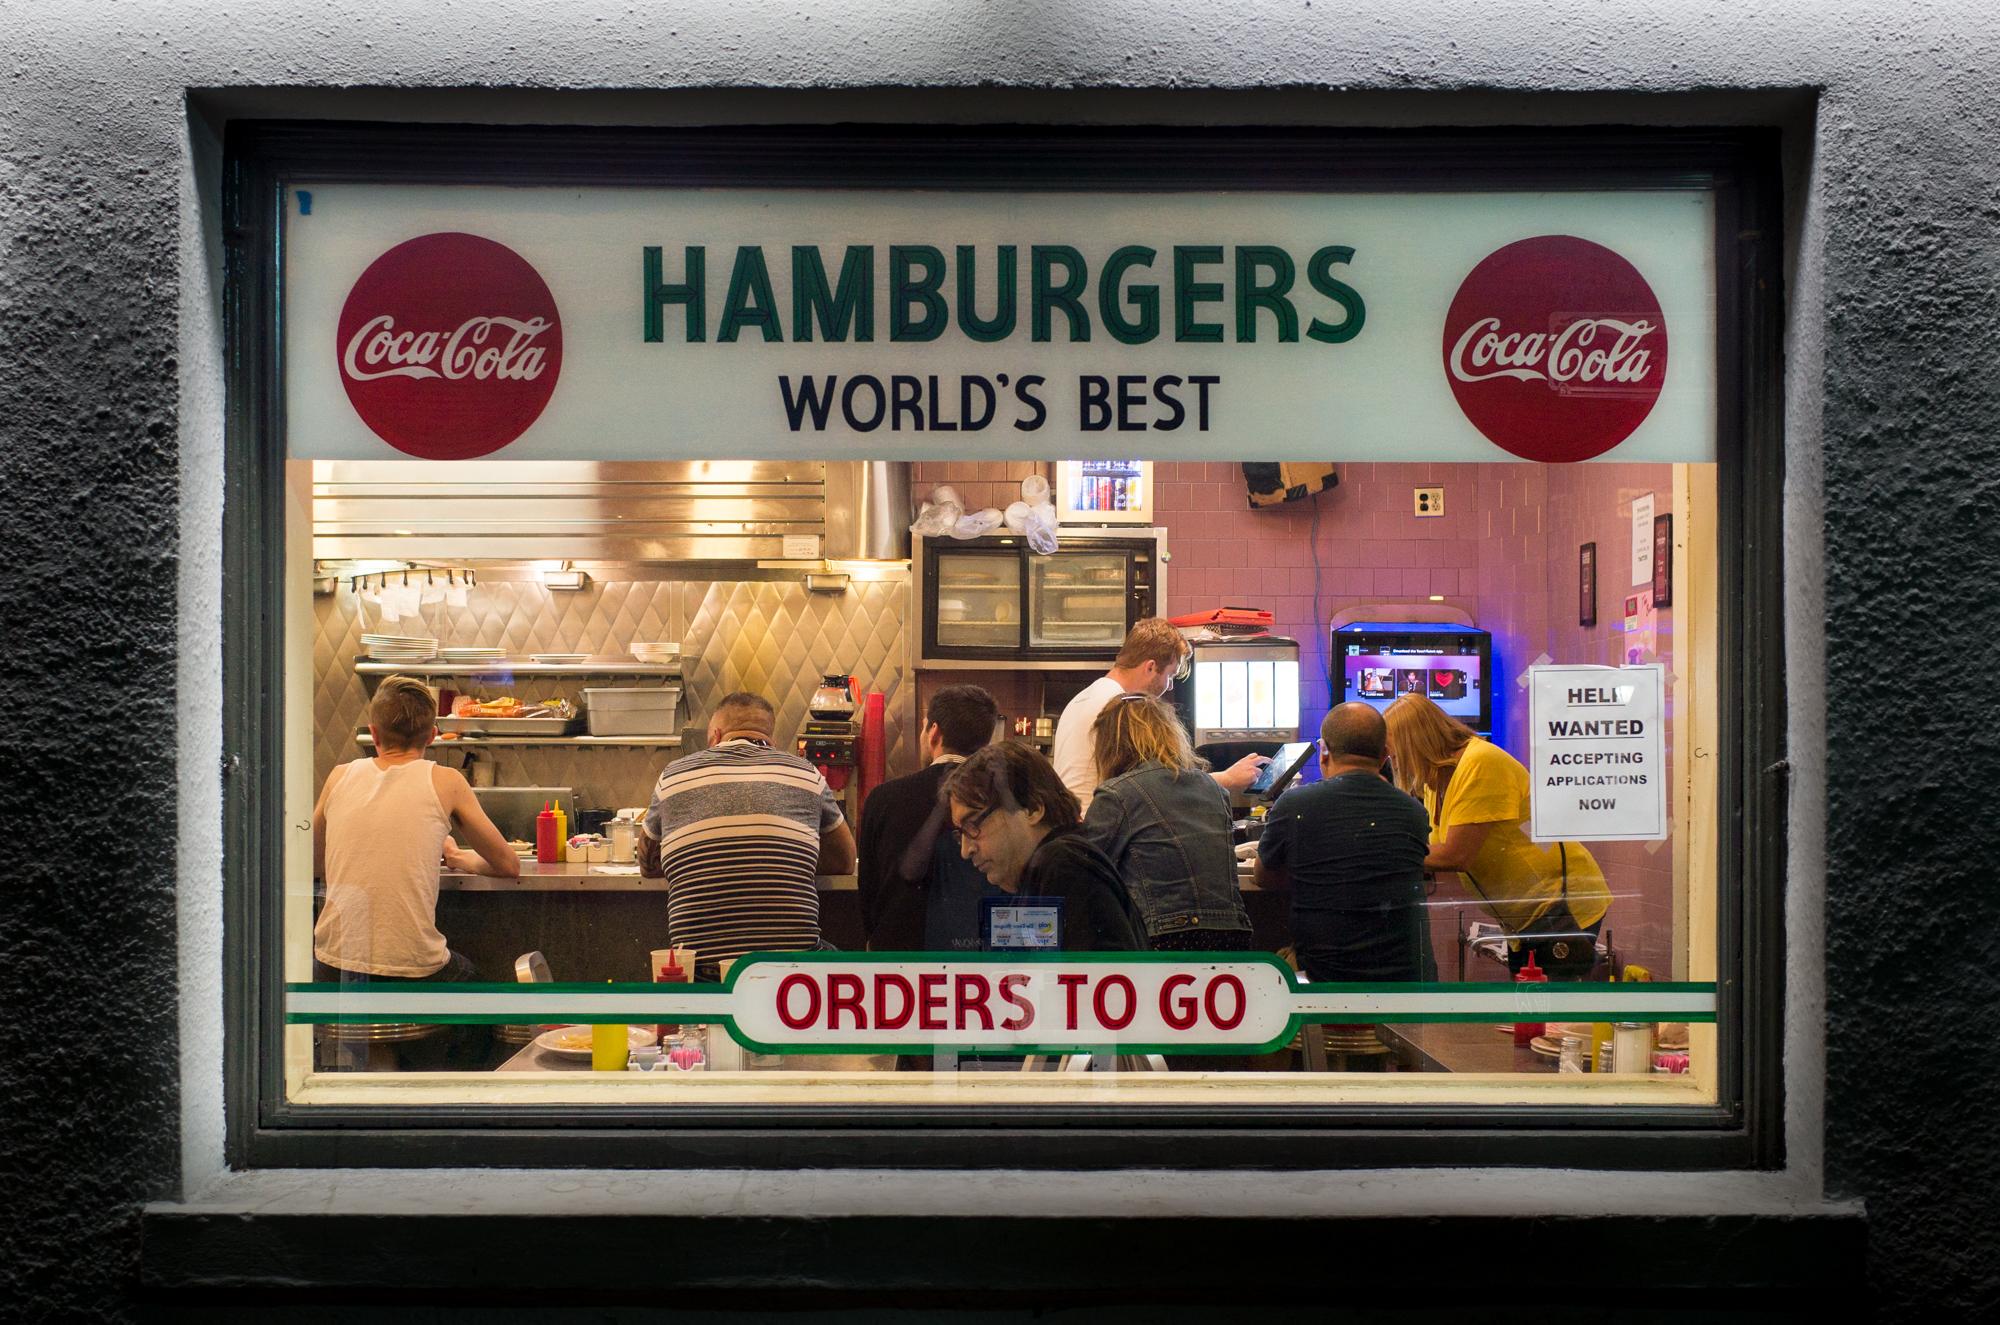 World's Best Hamburgers